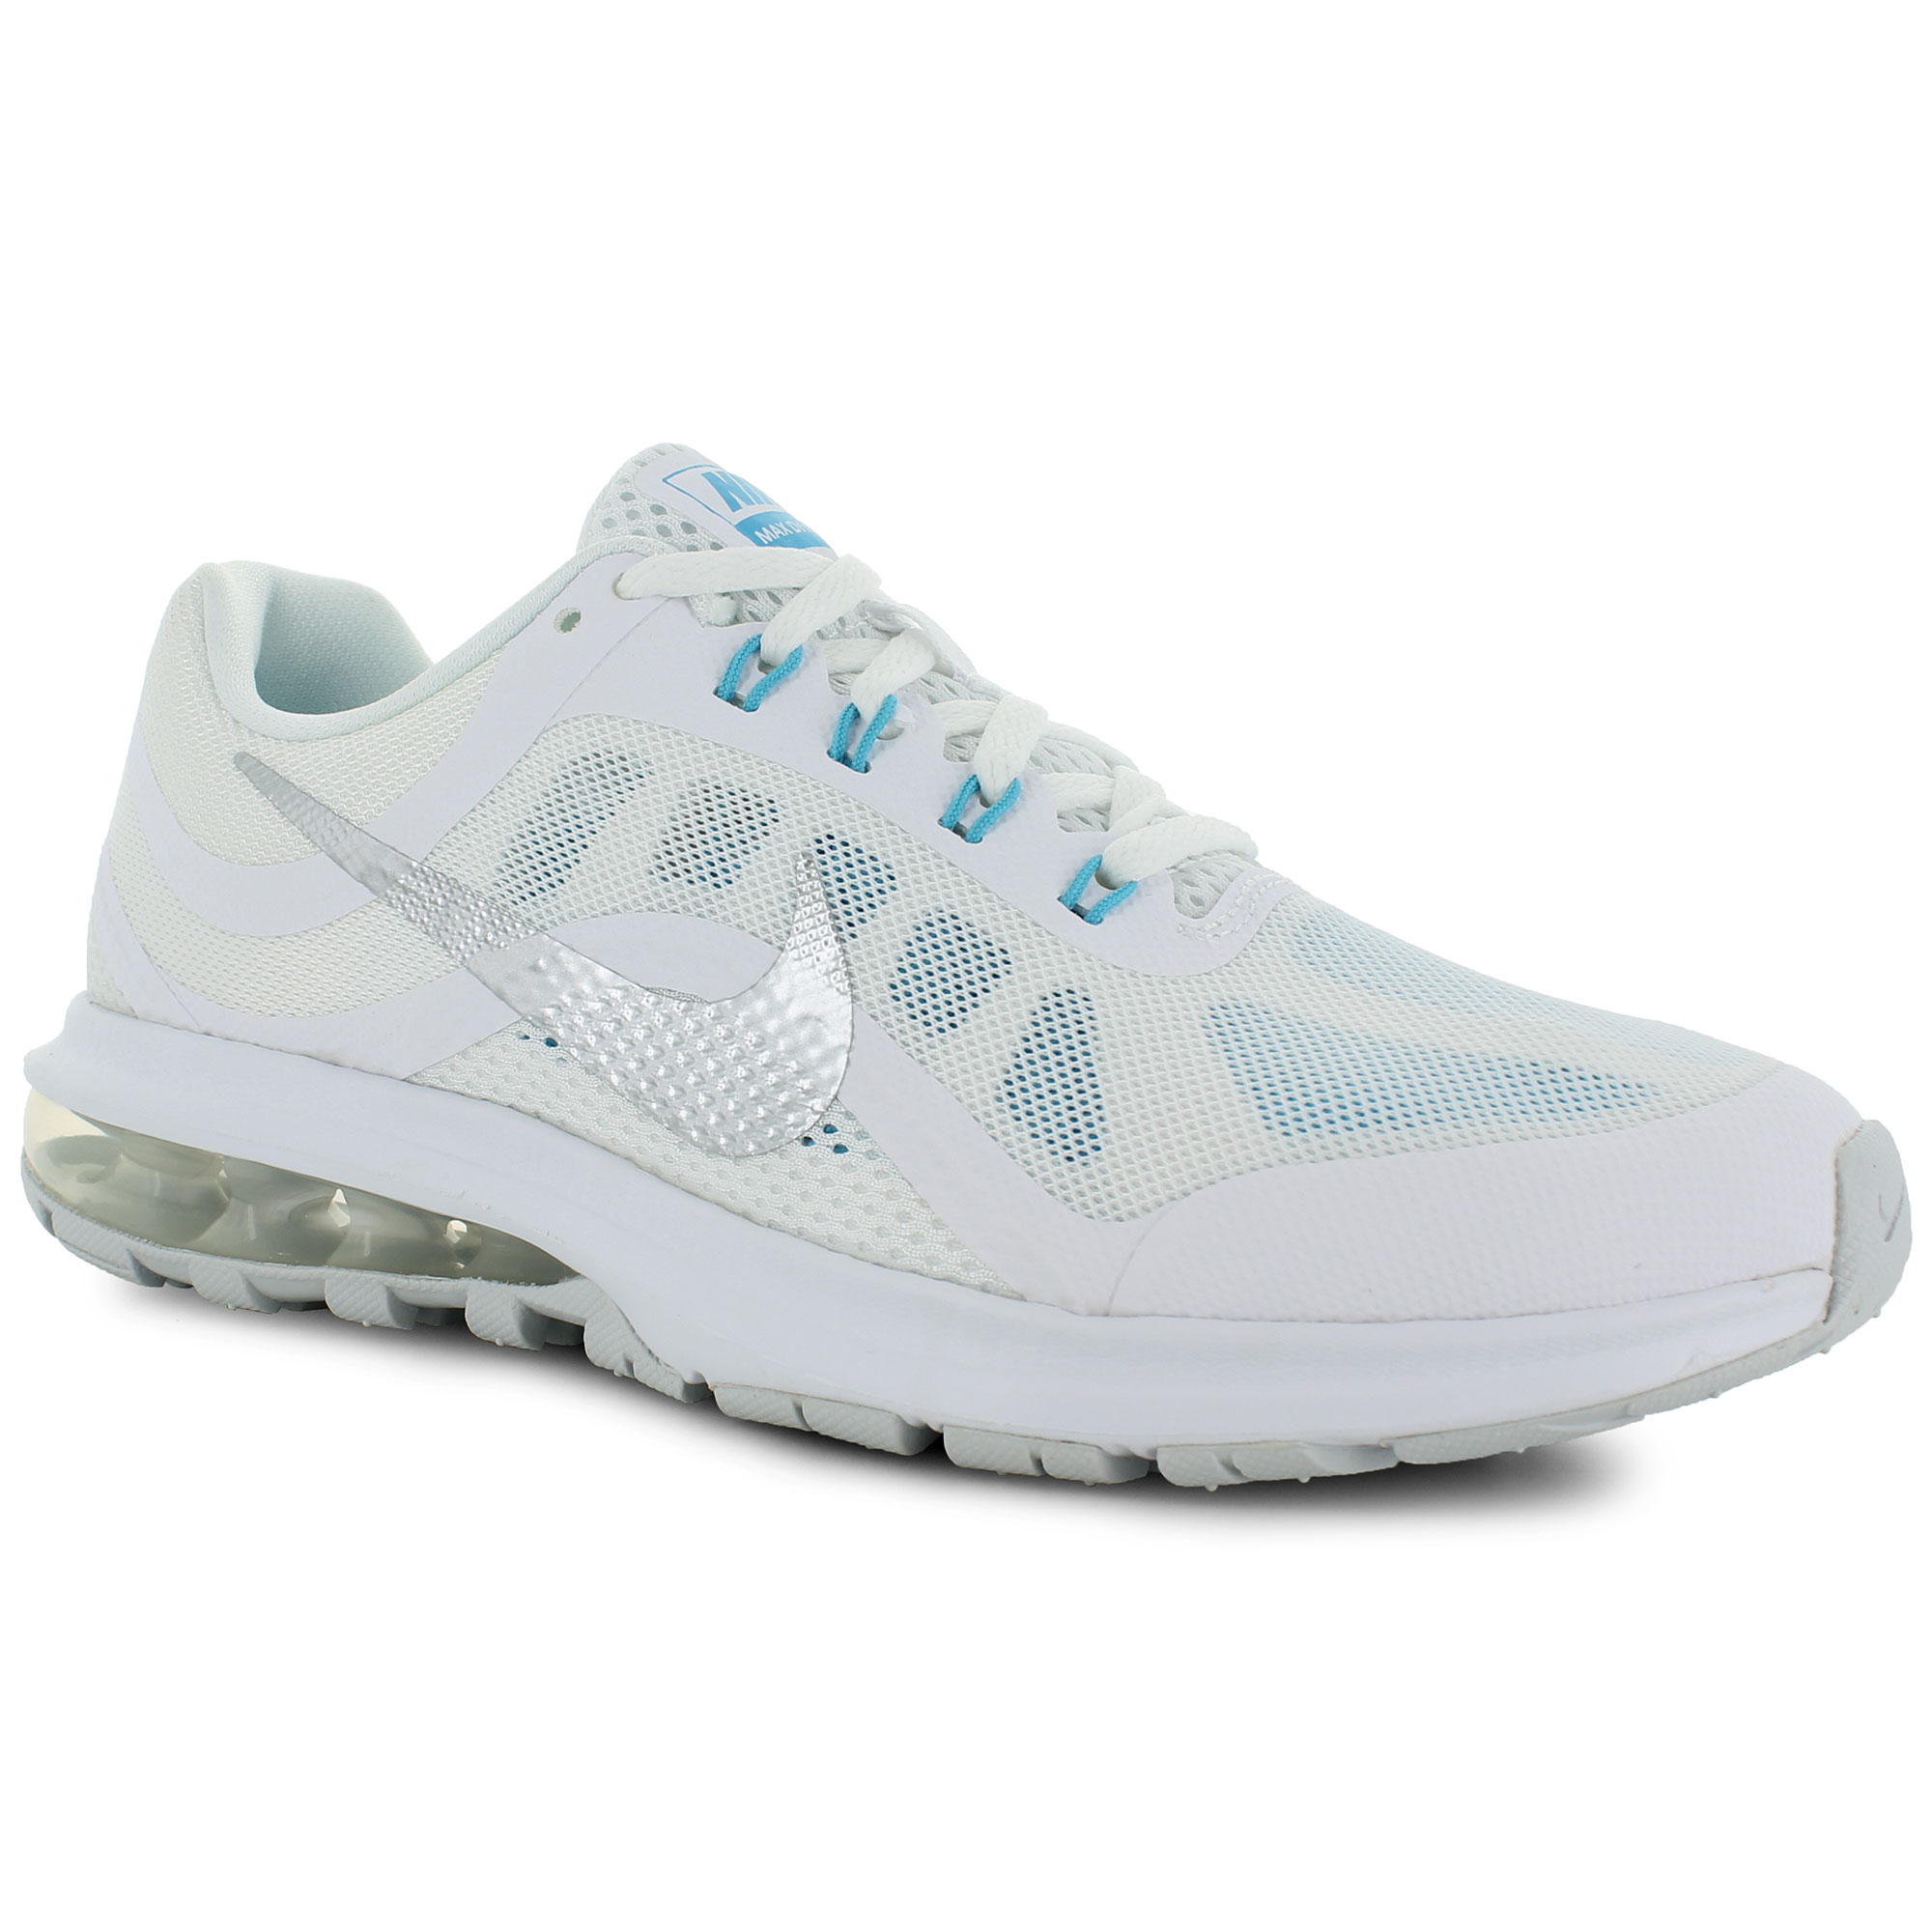 bc63eef50381 Nike Air Max Dynasty 2